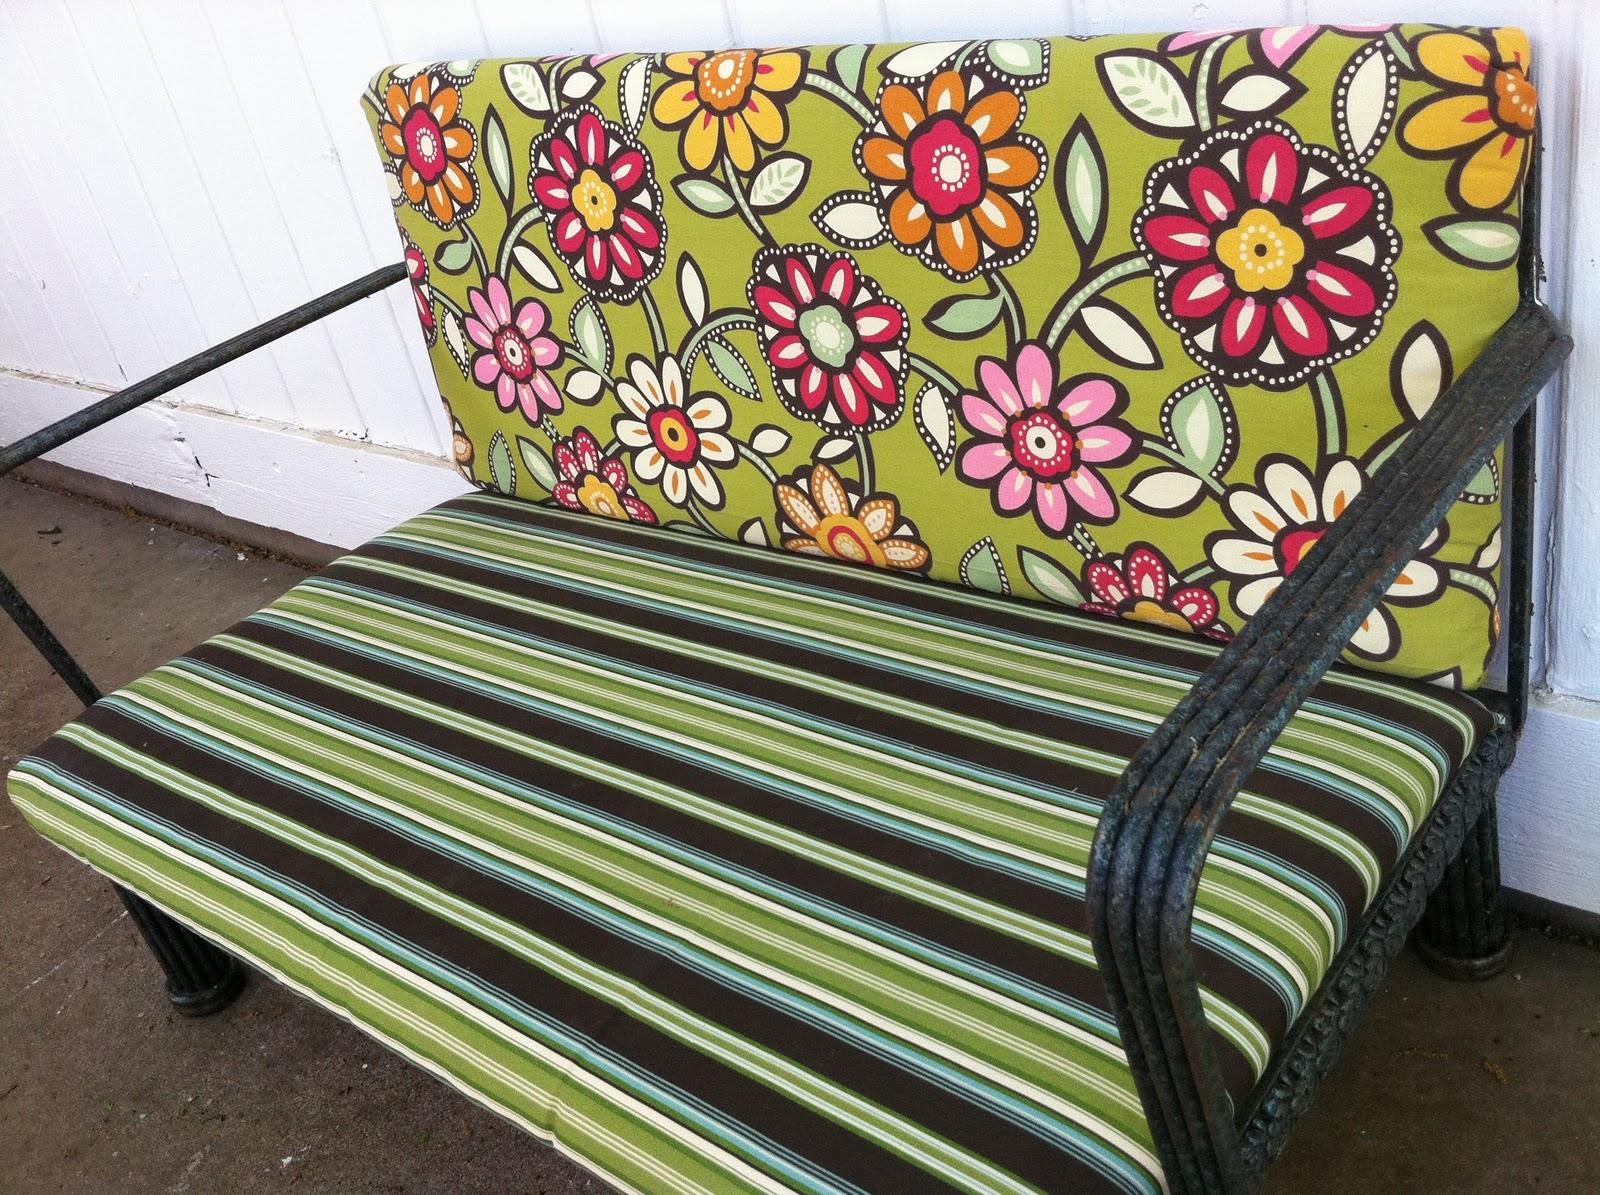 Naptime = Craft Time!: No-sew Patio Furniture Cushion Re-do